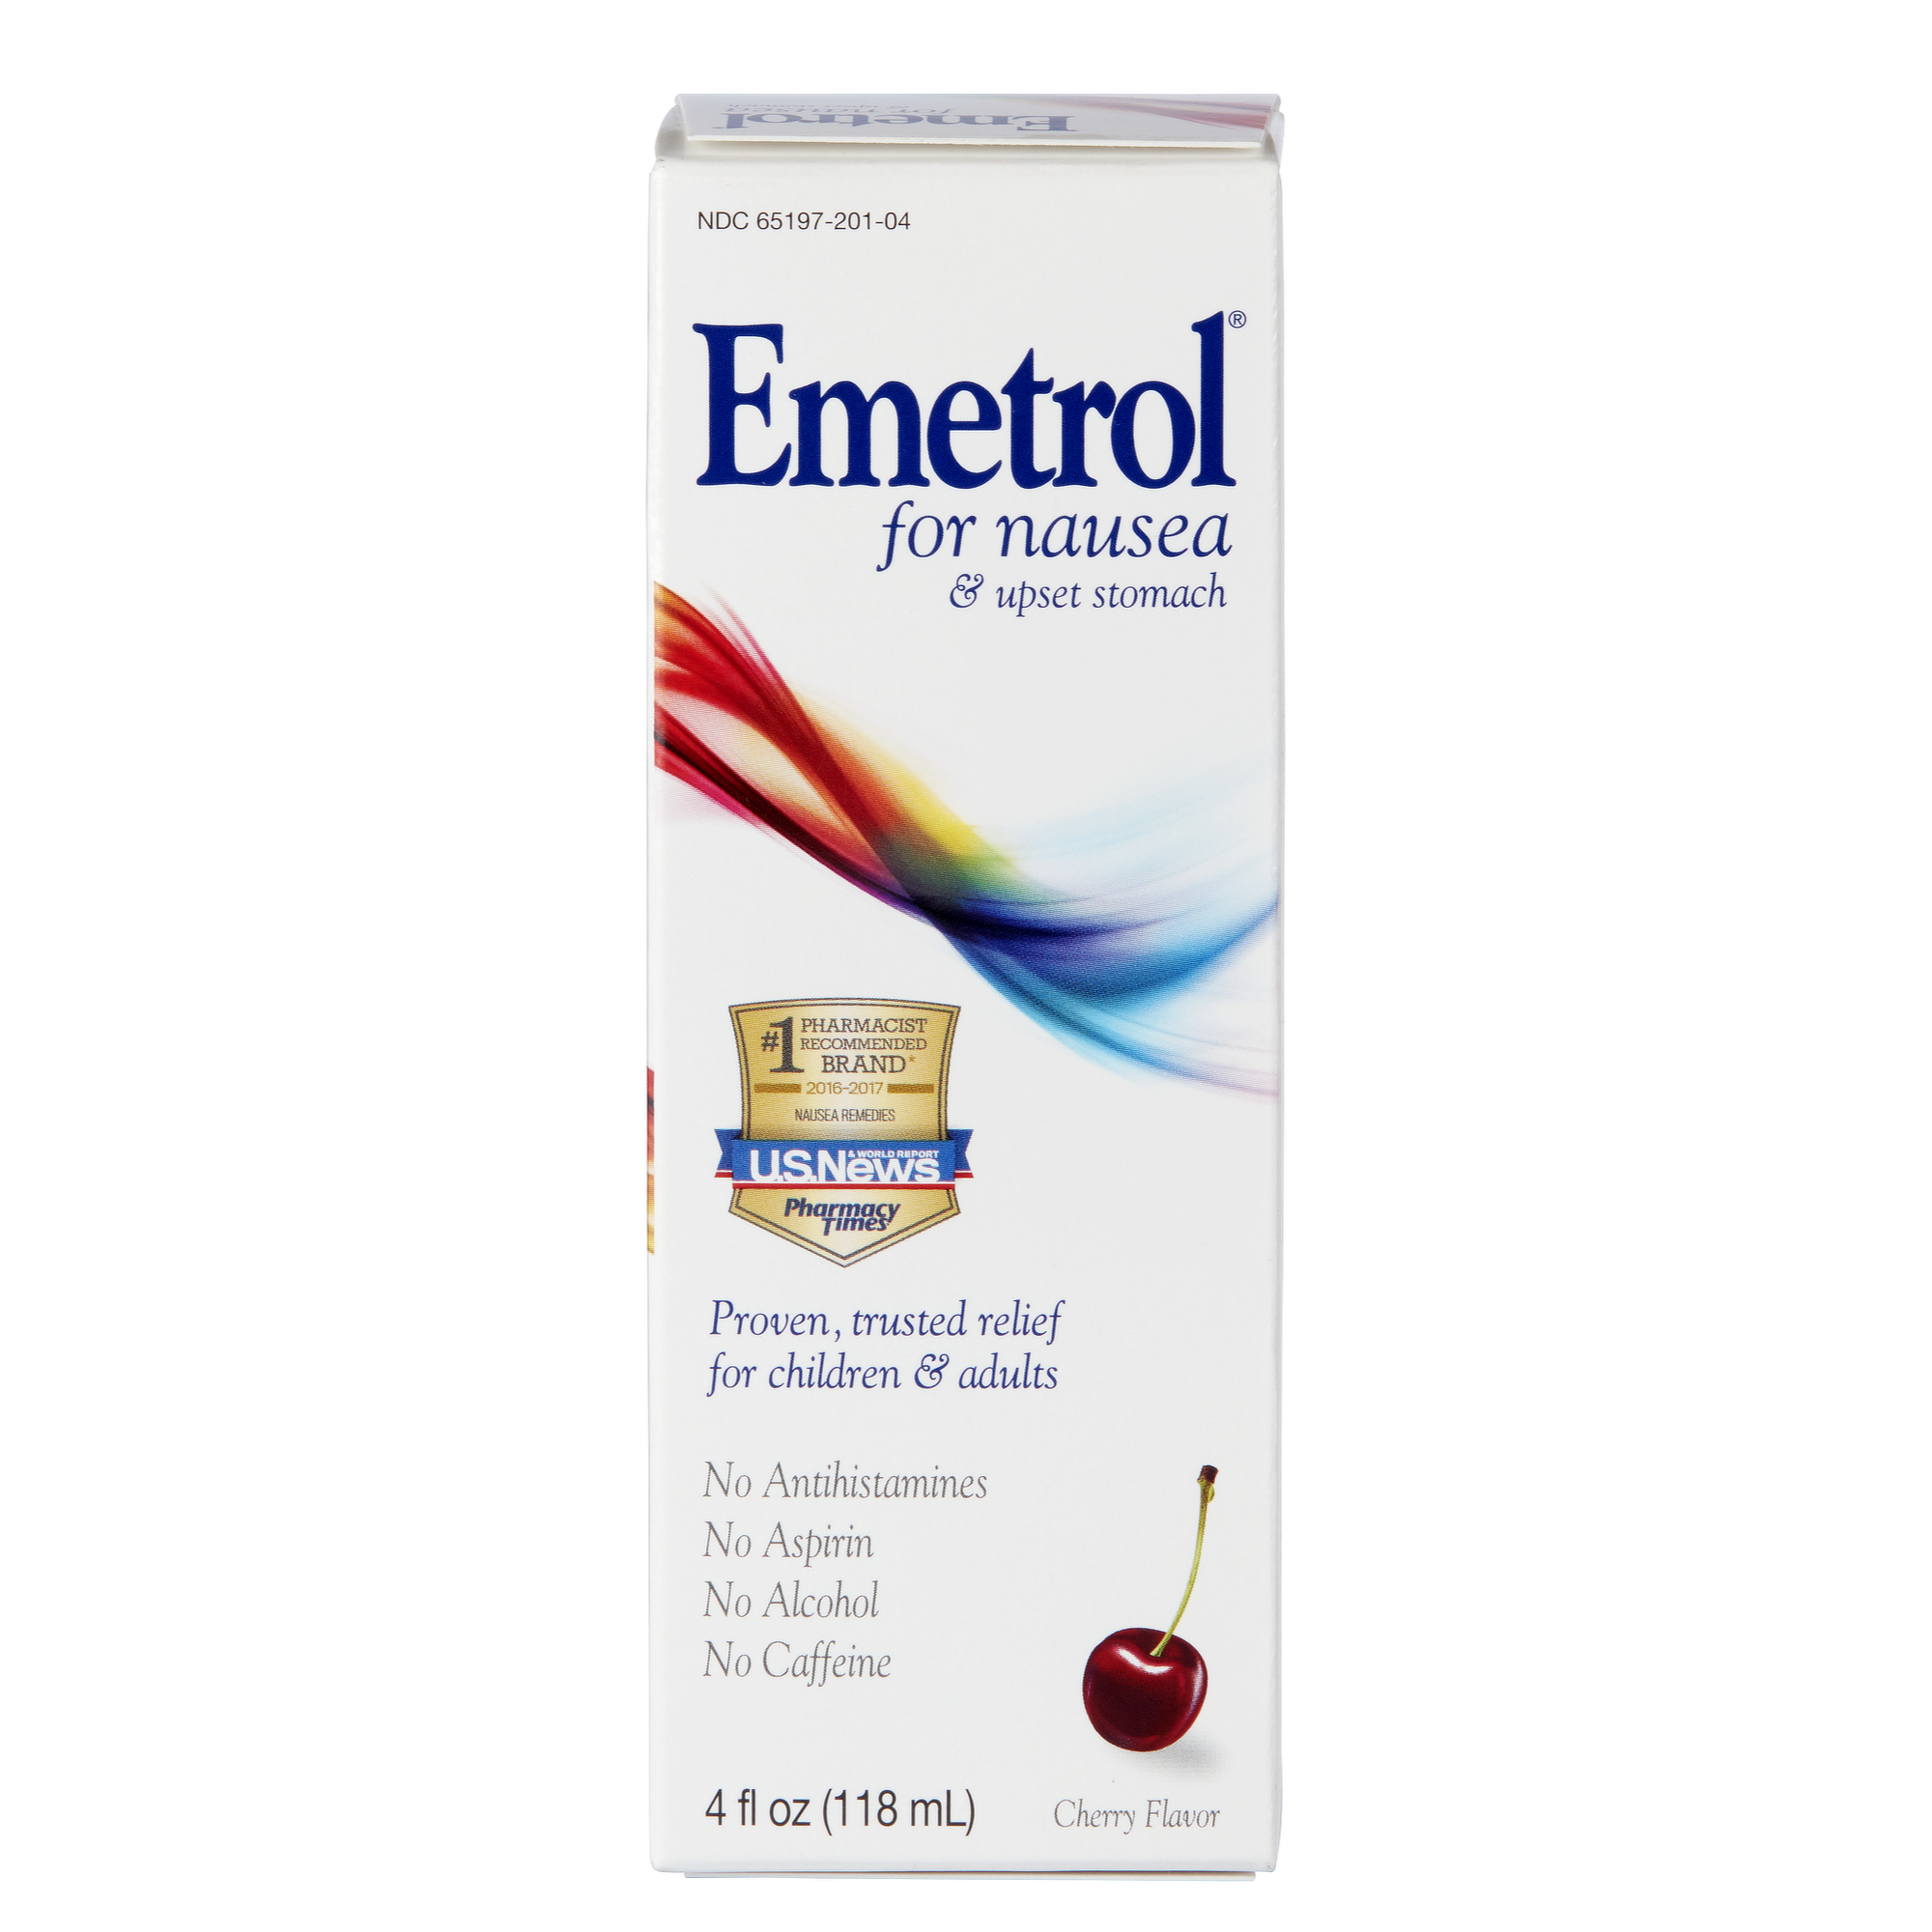 Emetrol Nausea and Upset Stomach Relief Liquid Medication, Cherry - 4 oz.